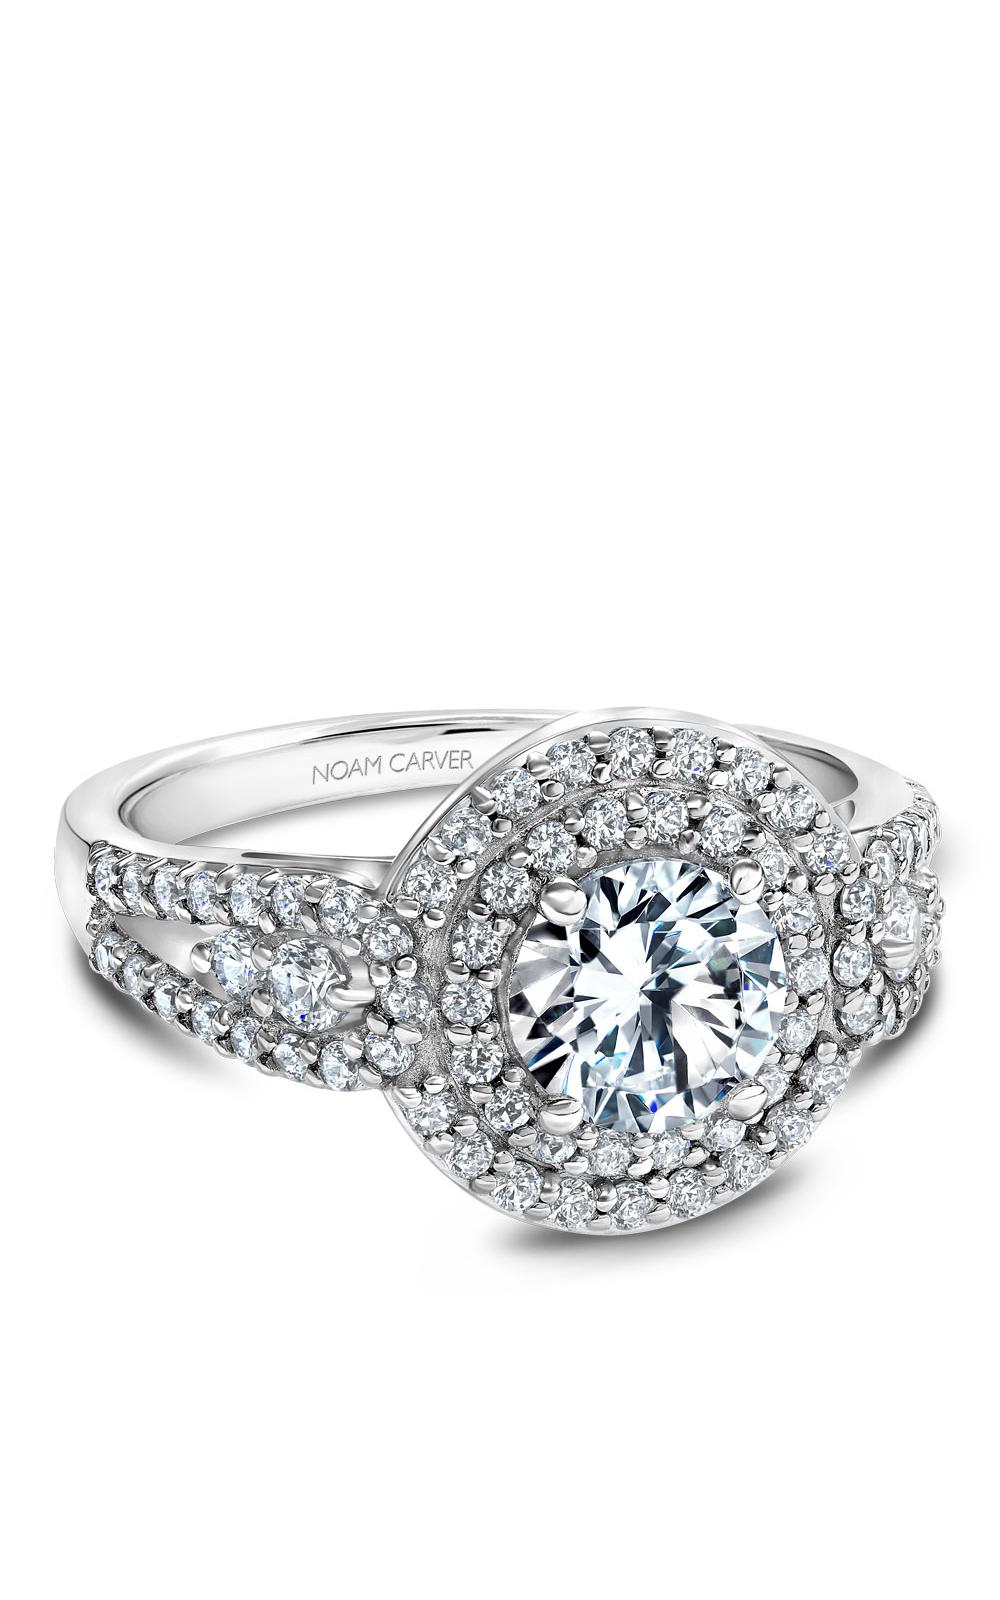 Noam Carver Halo Engagement Ring B194-01WM product image